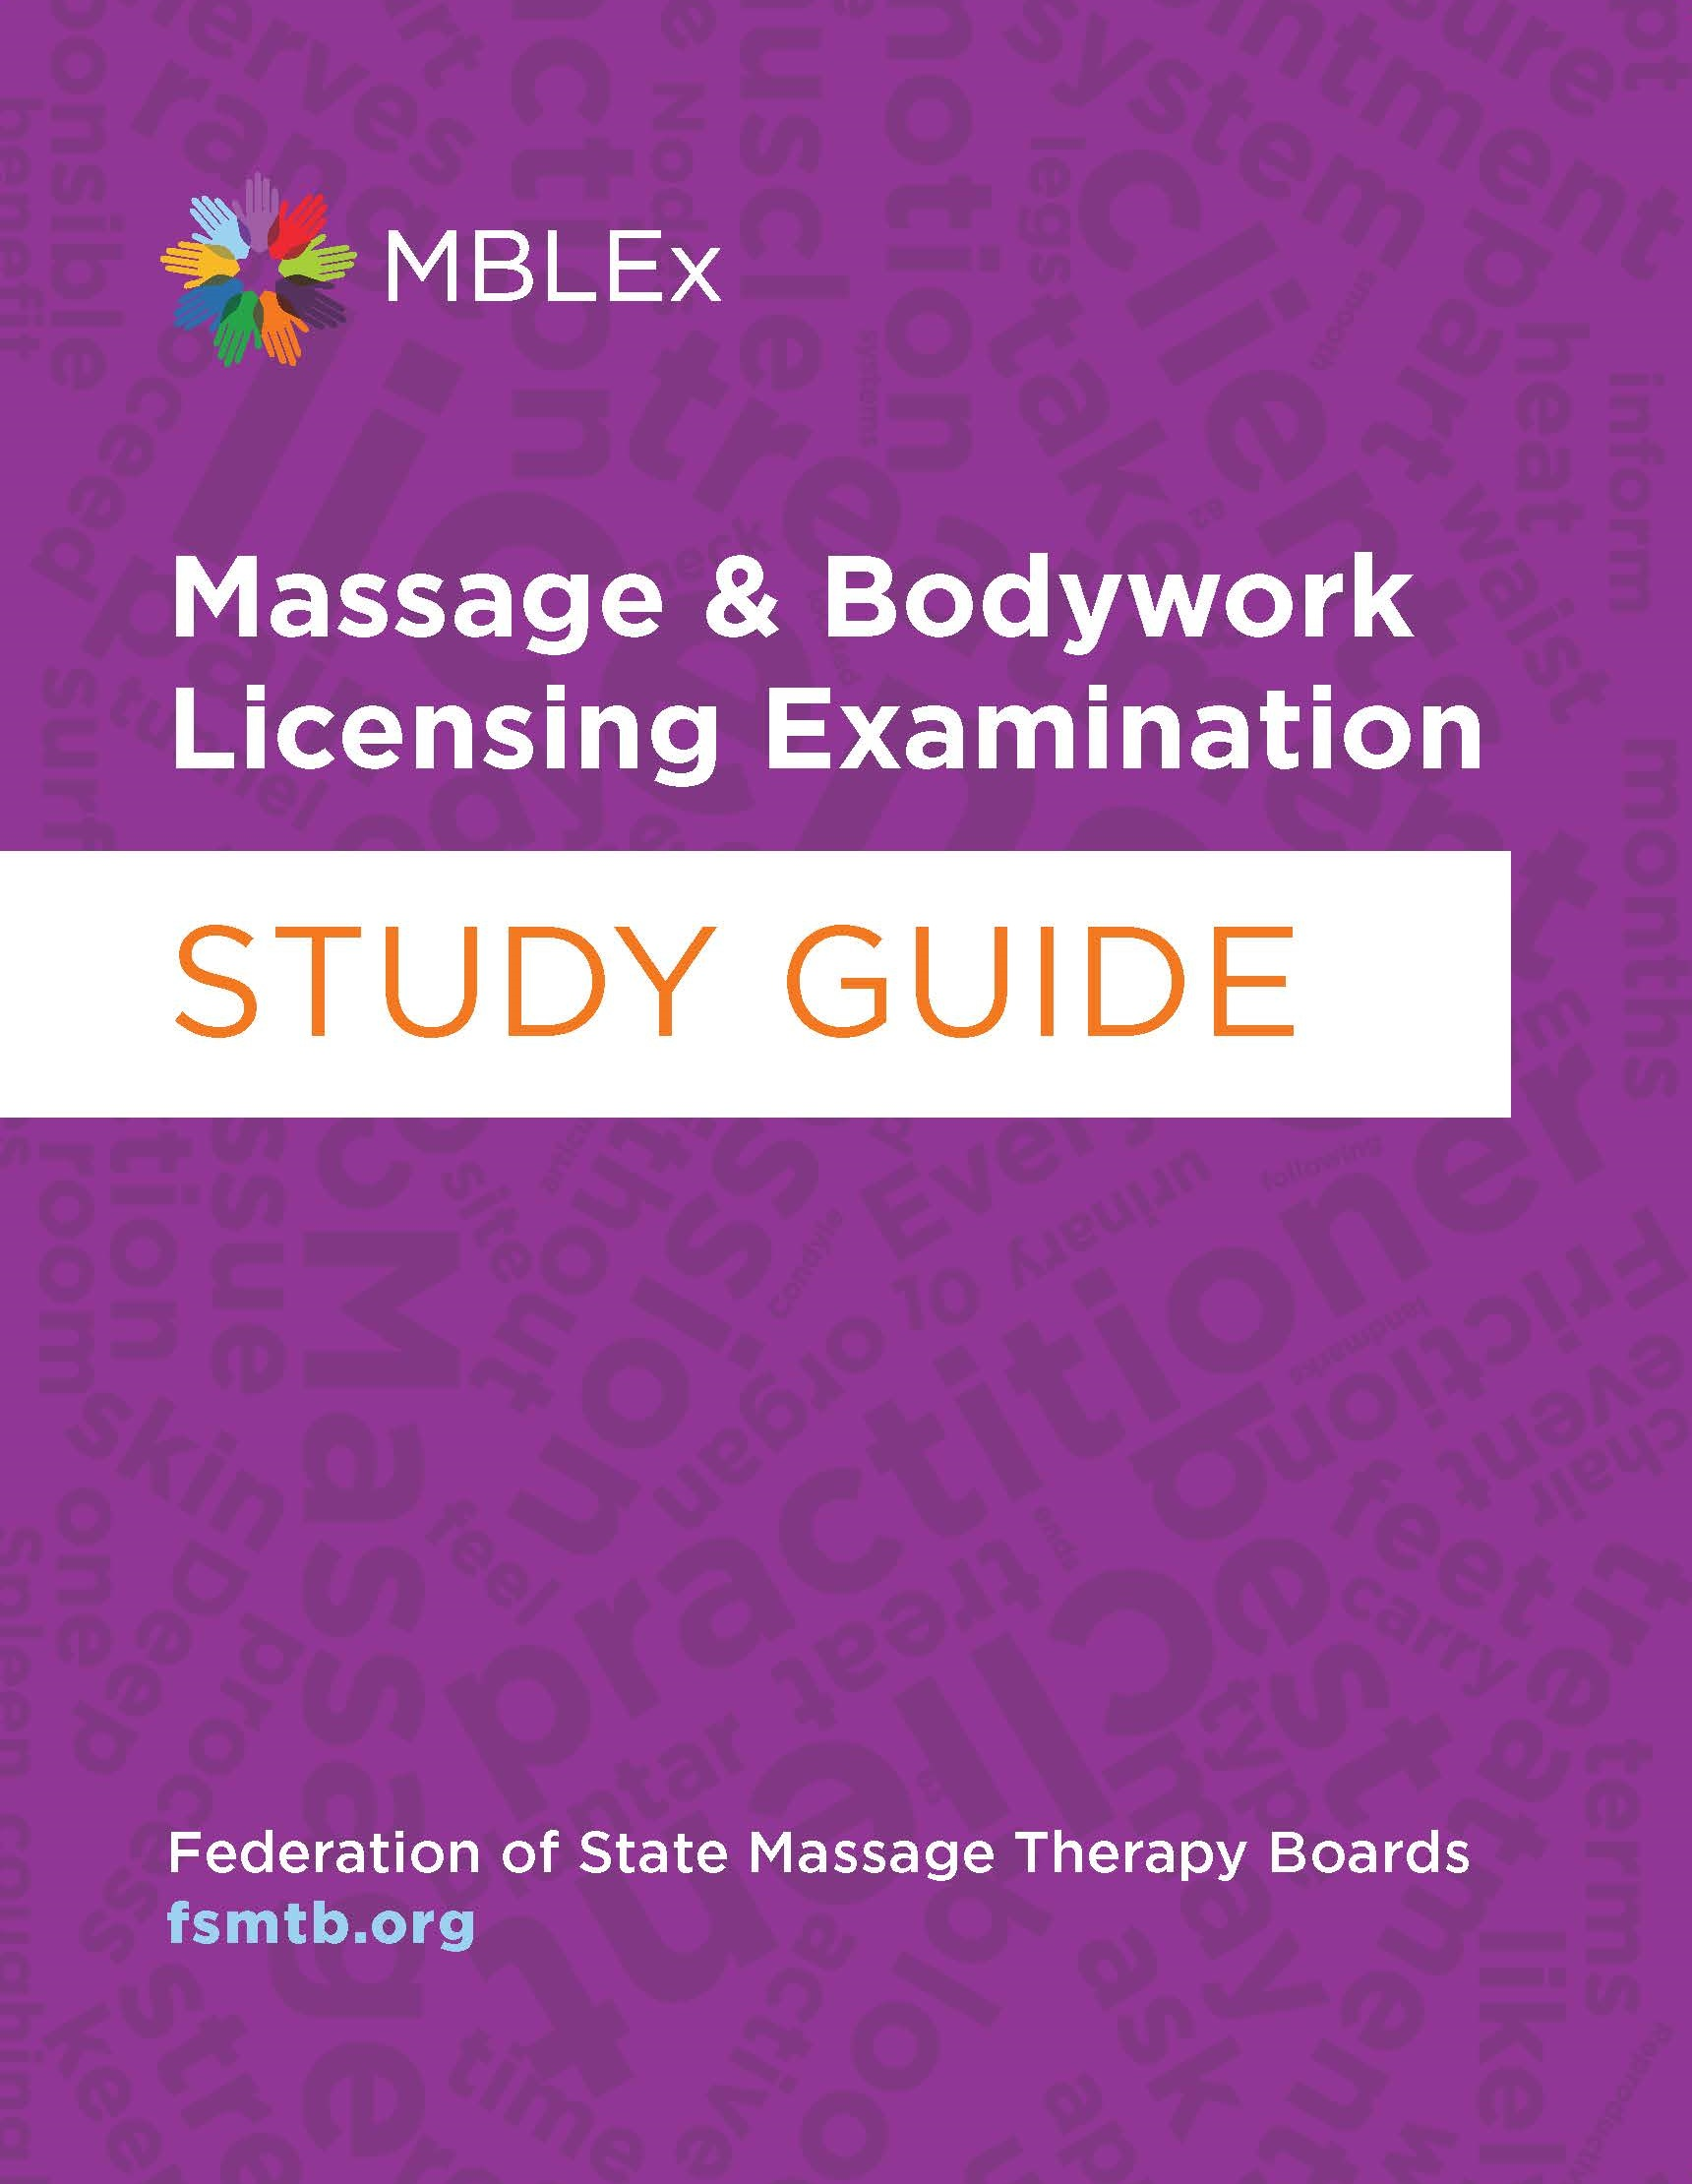 mblex study guide rh fsmtb org mblex study guide amazon mblex study guide online